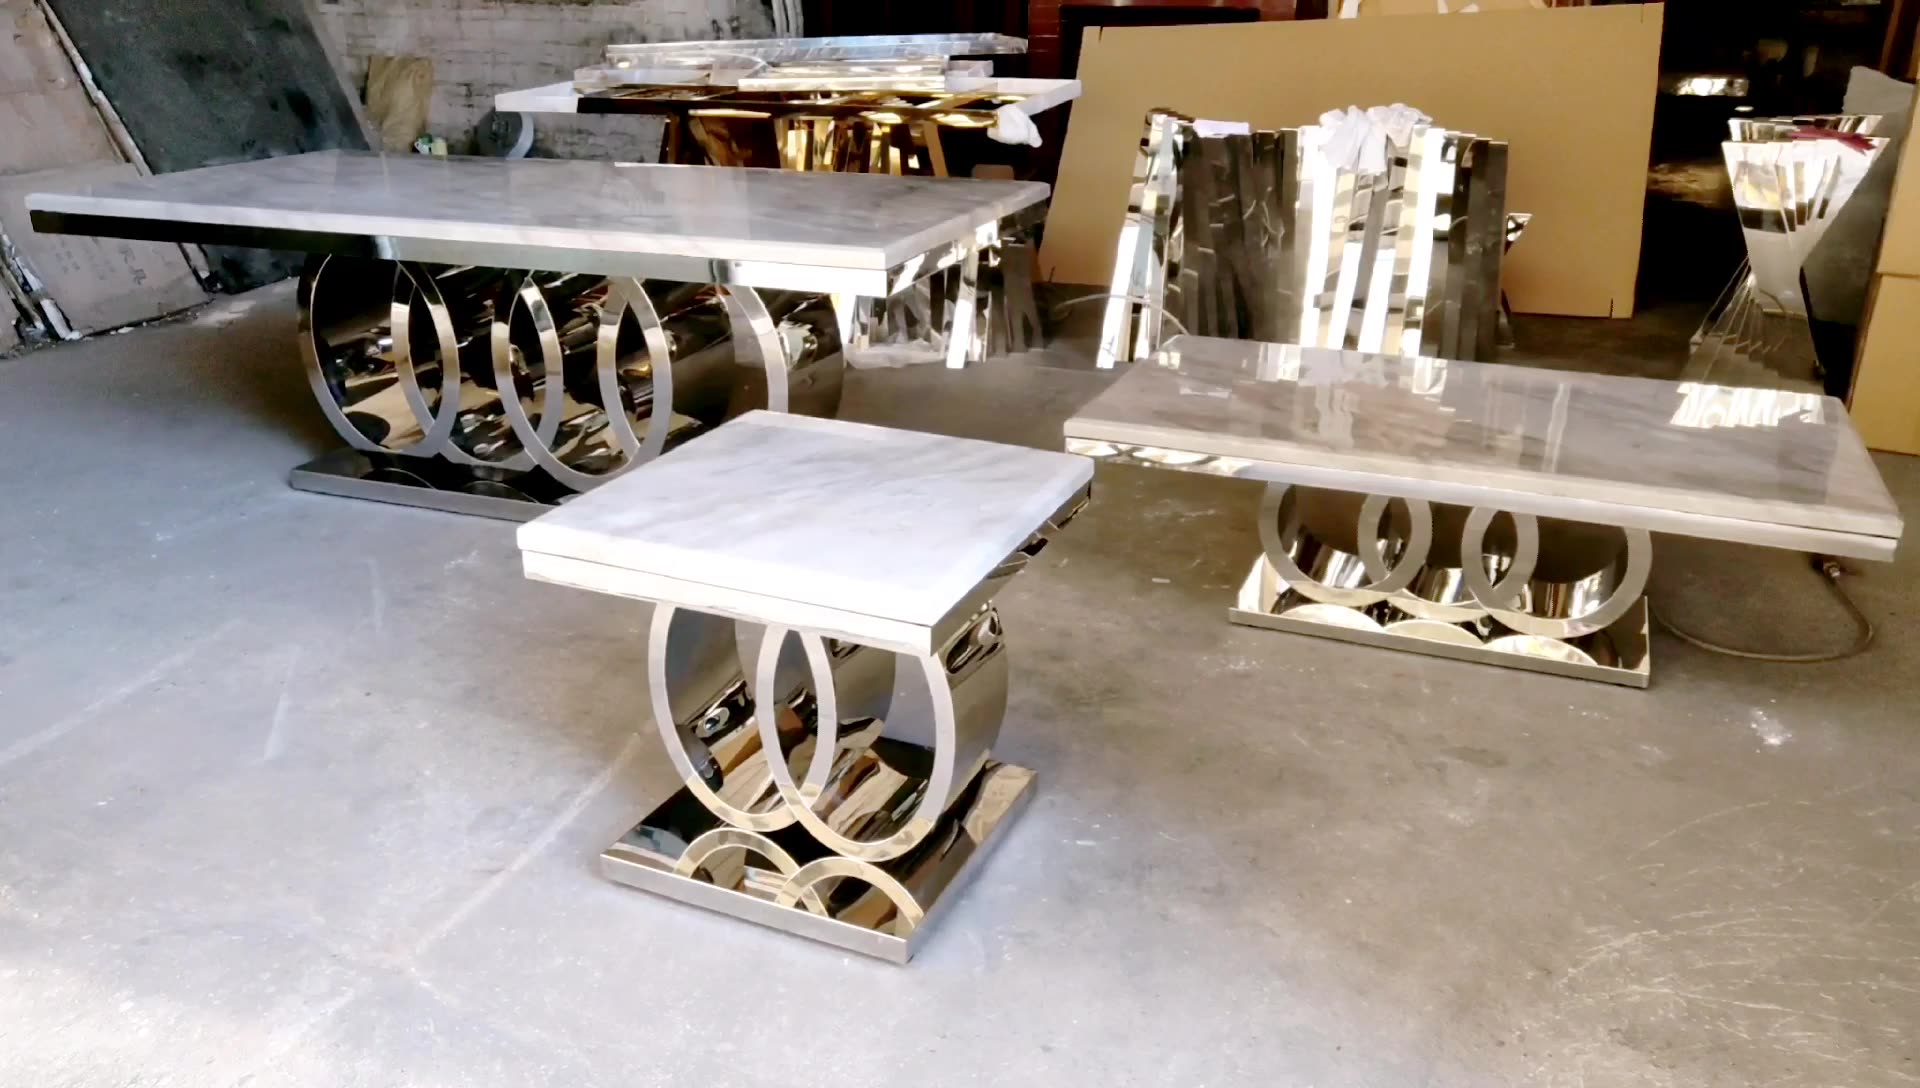 Moderno diseño de mesa de comedor de mármol con 8 sillas